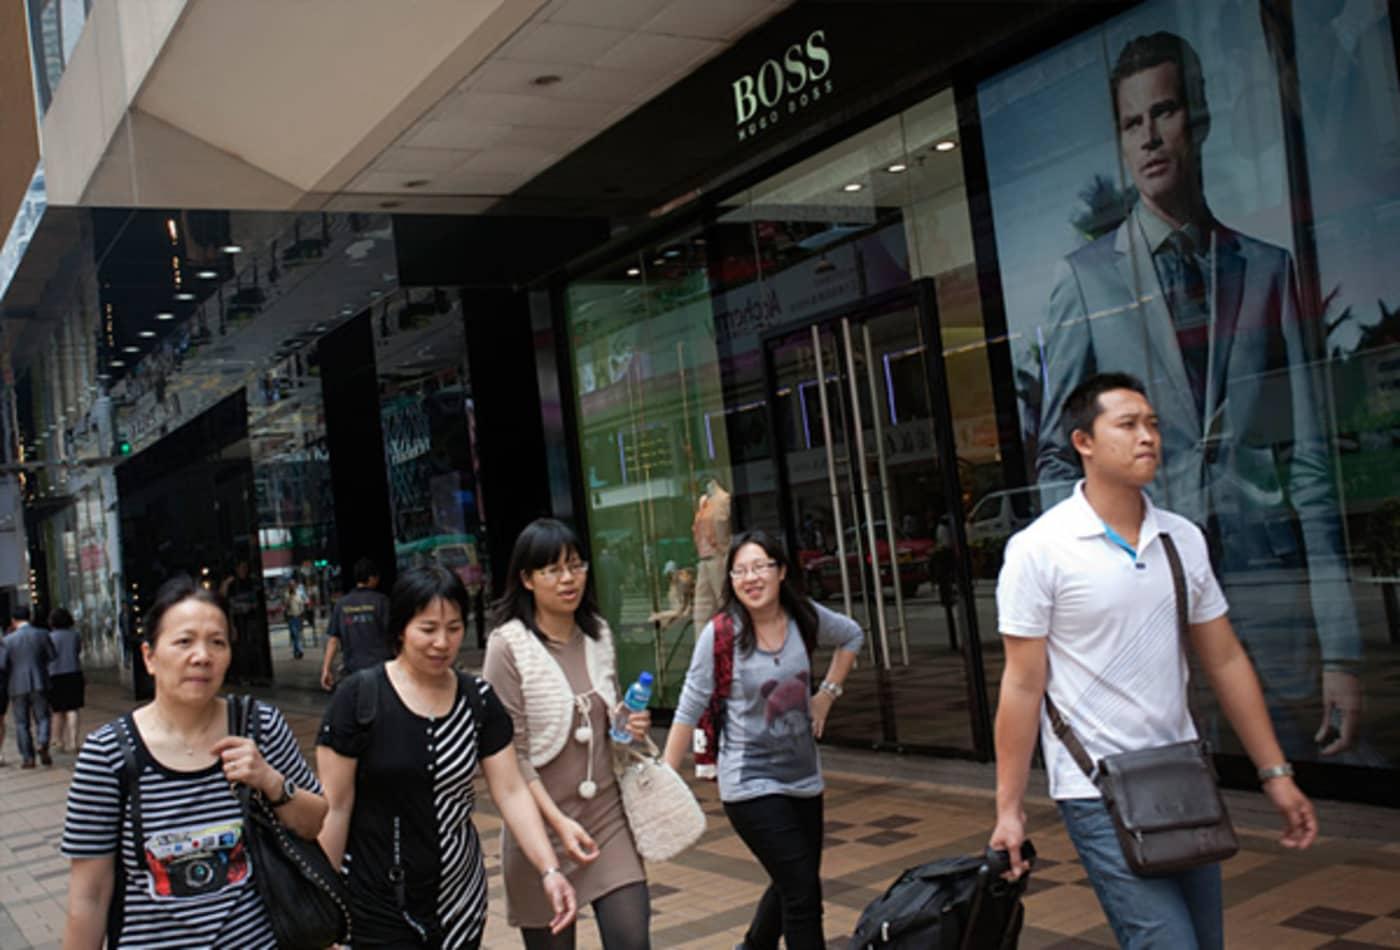 Retails-hottest-emerging-markets-2012-china.jpg